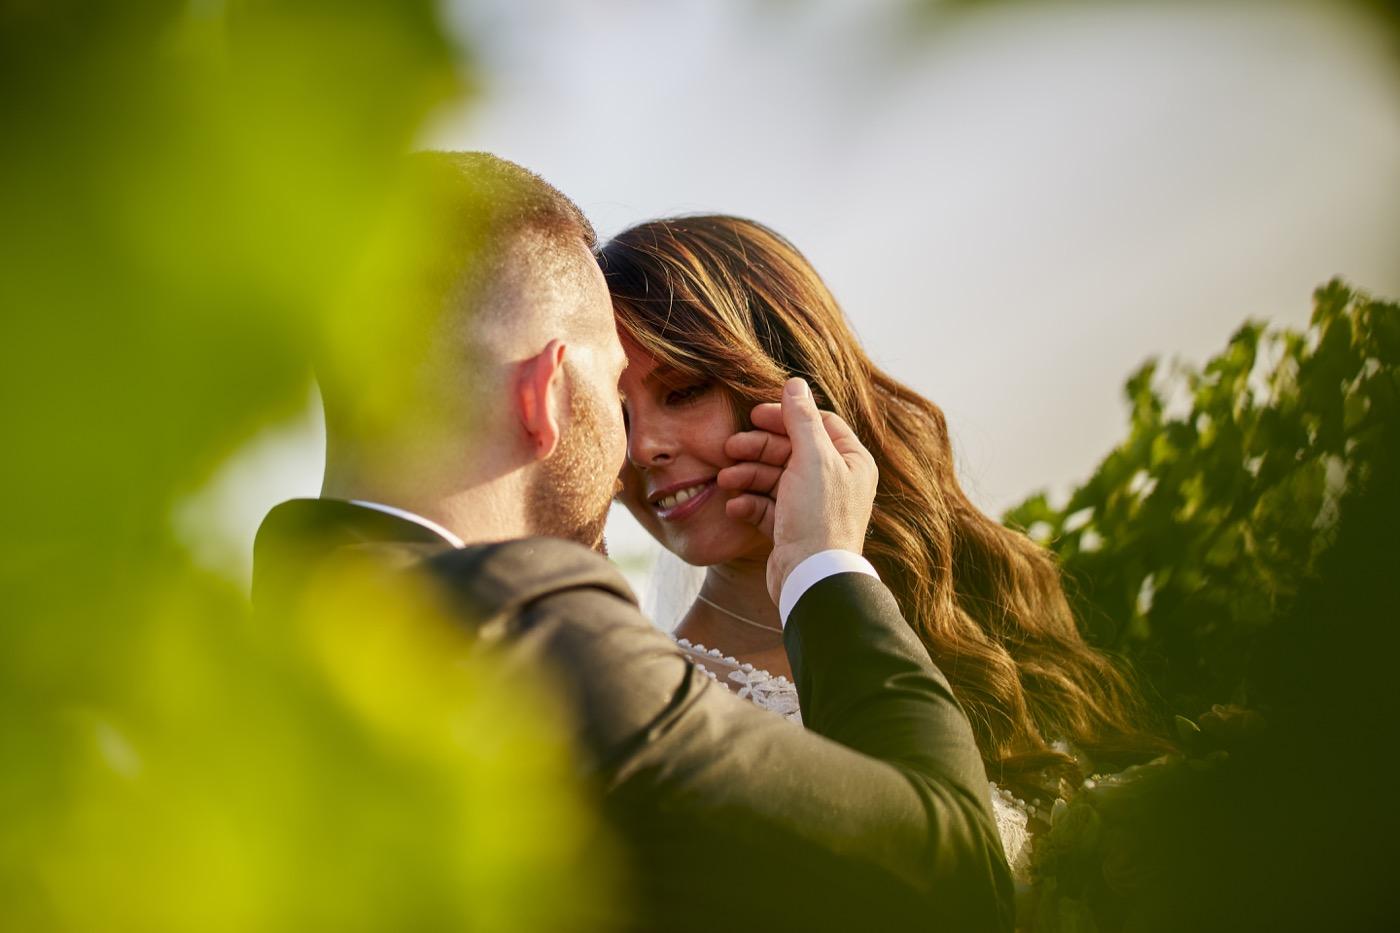 Claudio-Coppola-wedding-photographer-la-scuderia-eventi-preparativi-la-rosetta-perugia-70